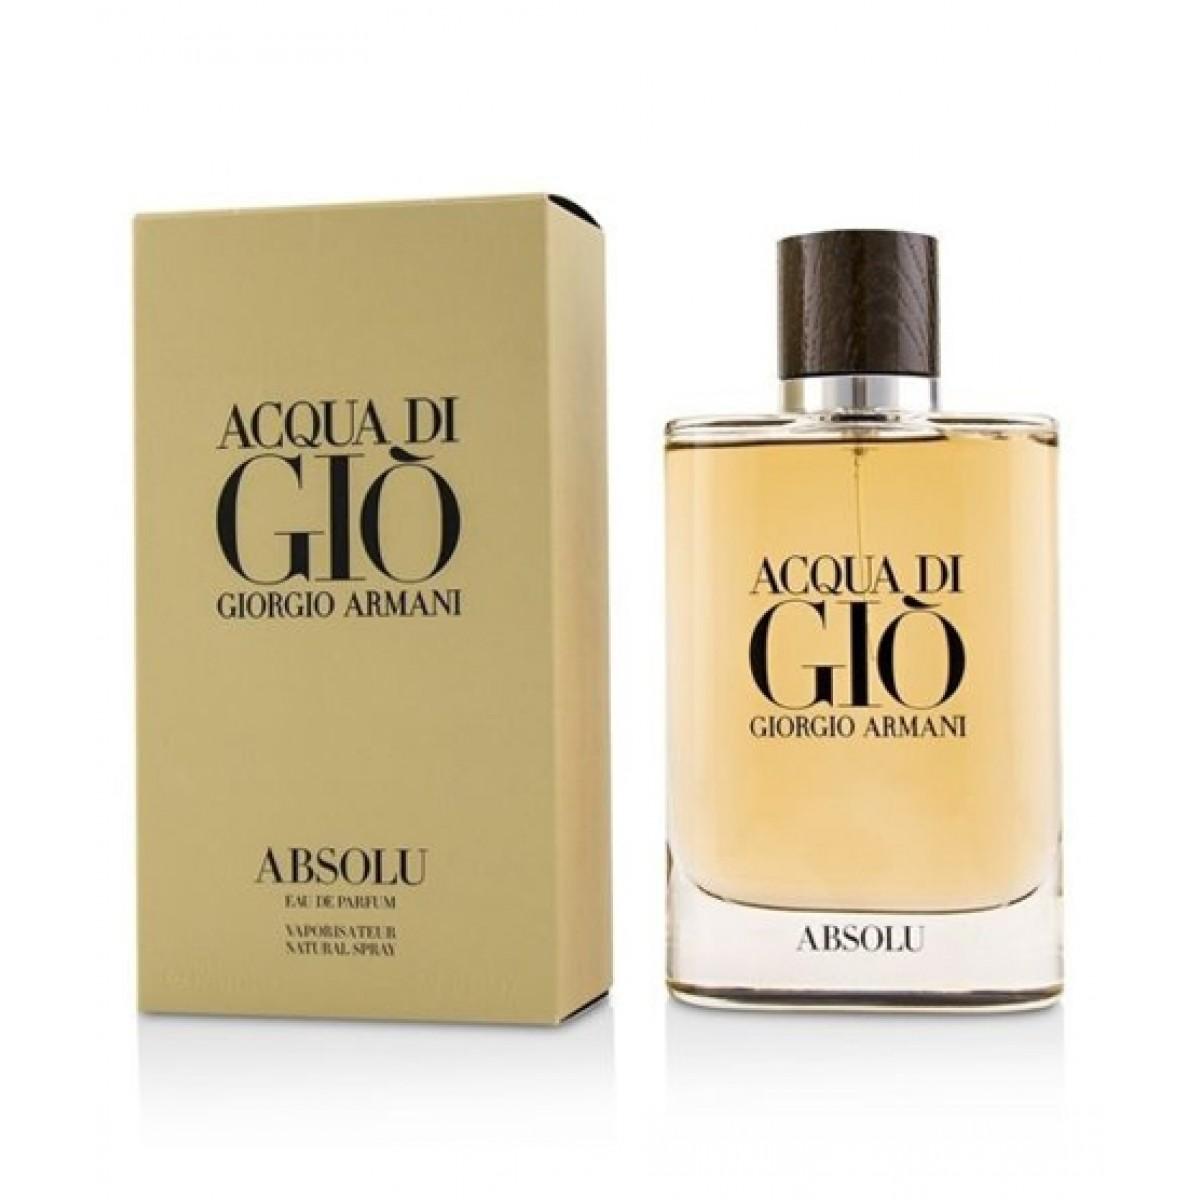 Giorgio Armani Acqua Di Gio Eau De Parfum Price In Pakistan Buy